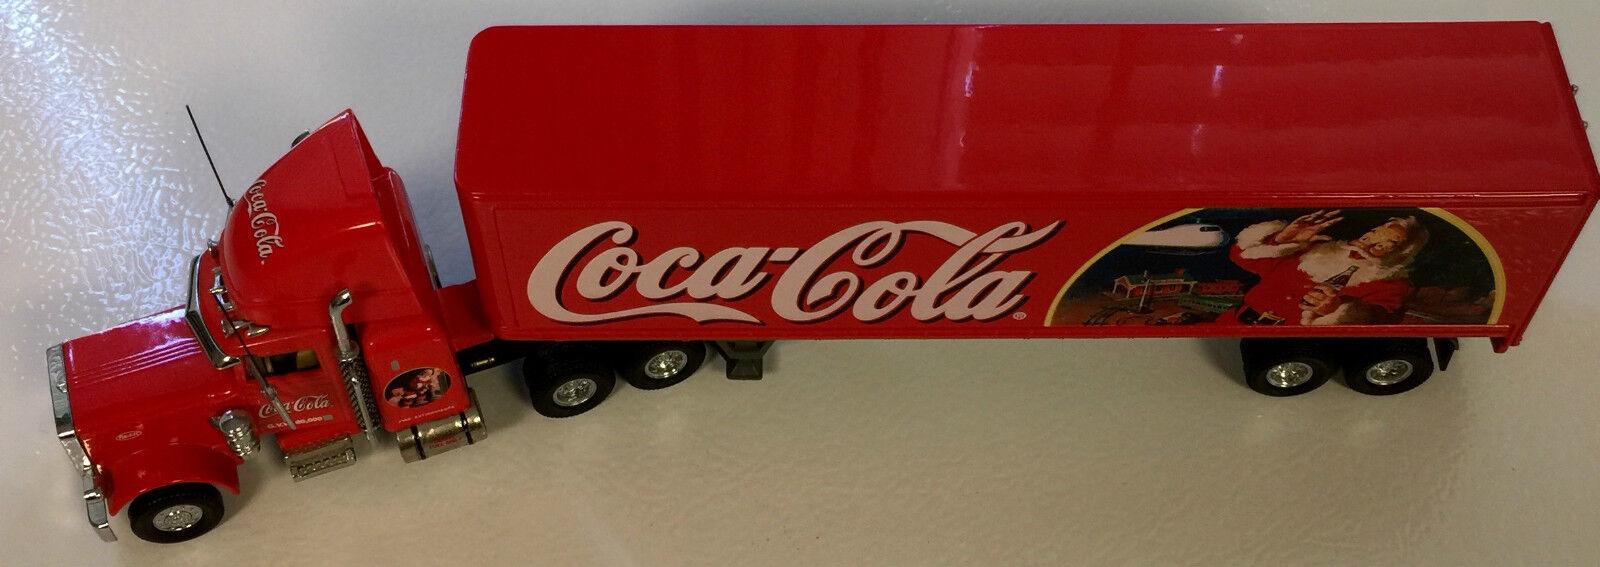 Matchbox Coca-Cola Temporadas Saludos Peterbilt 359 Long Hauler 1 58 Escala